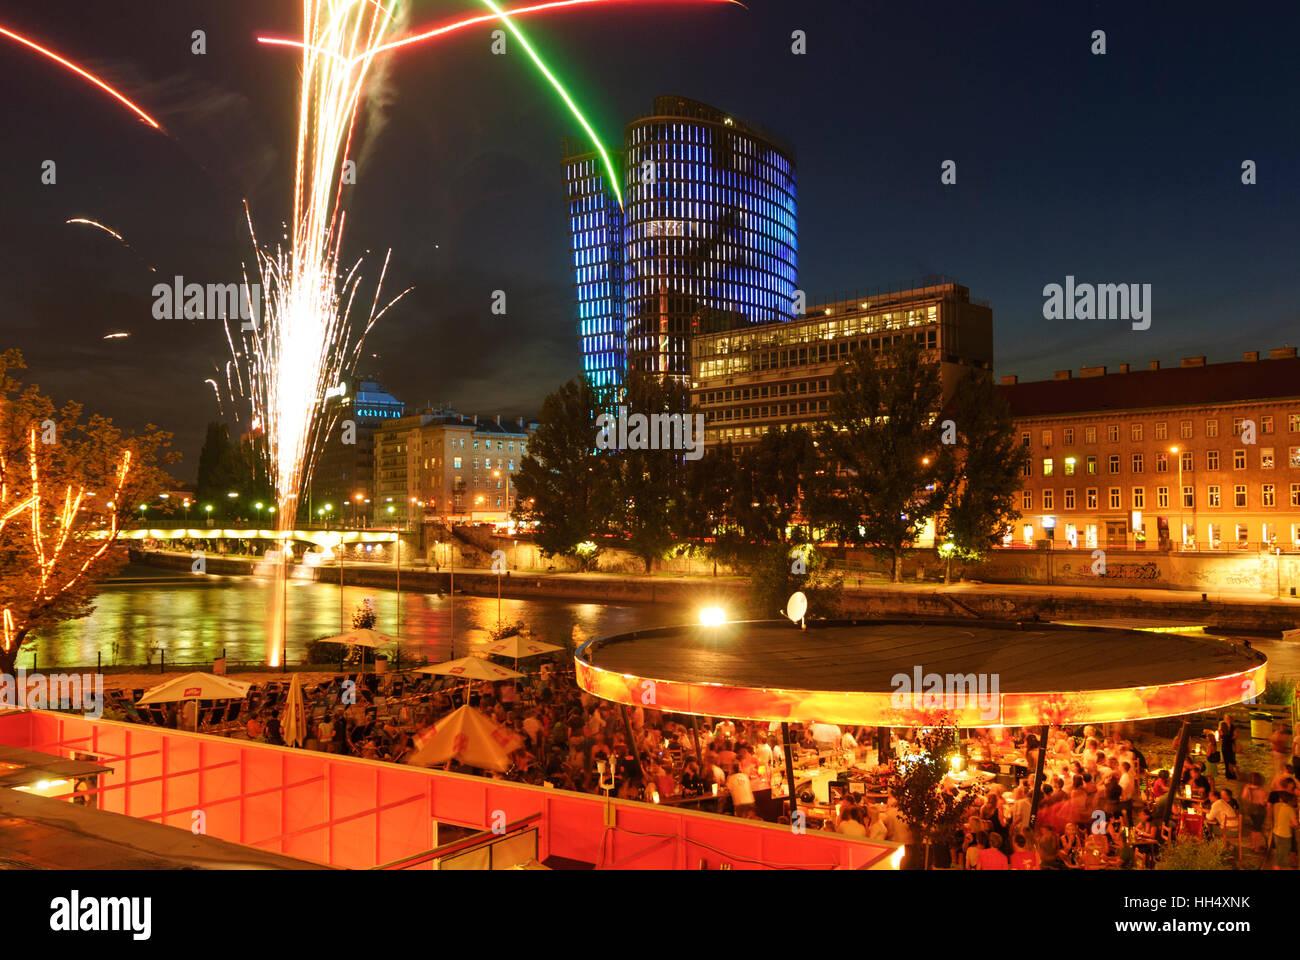 Wien, Vienna: beach bar Herrmann at the Danube canal with Uniqa Tower, fireworks, 03., Wien, Austria - Stock Image